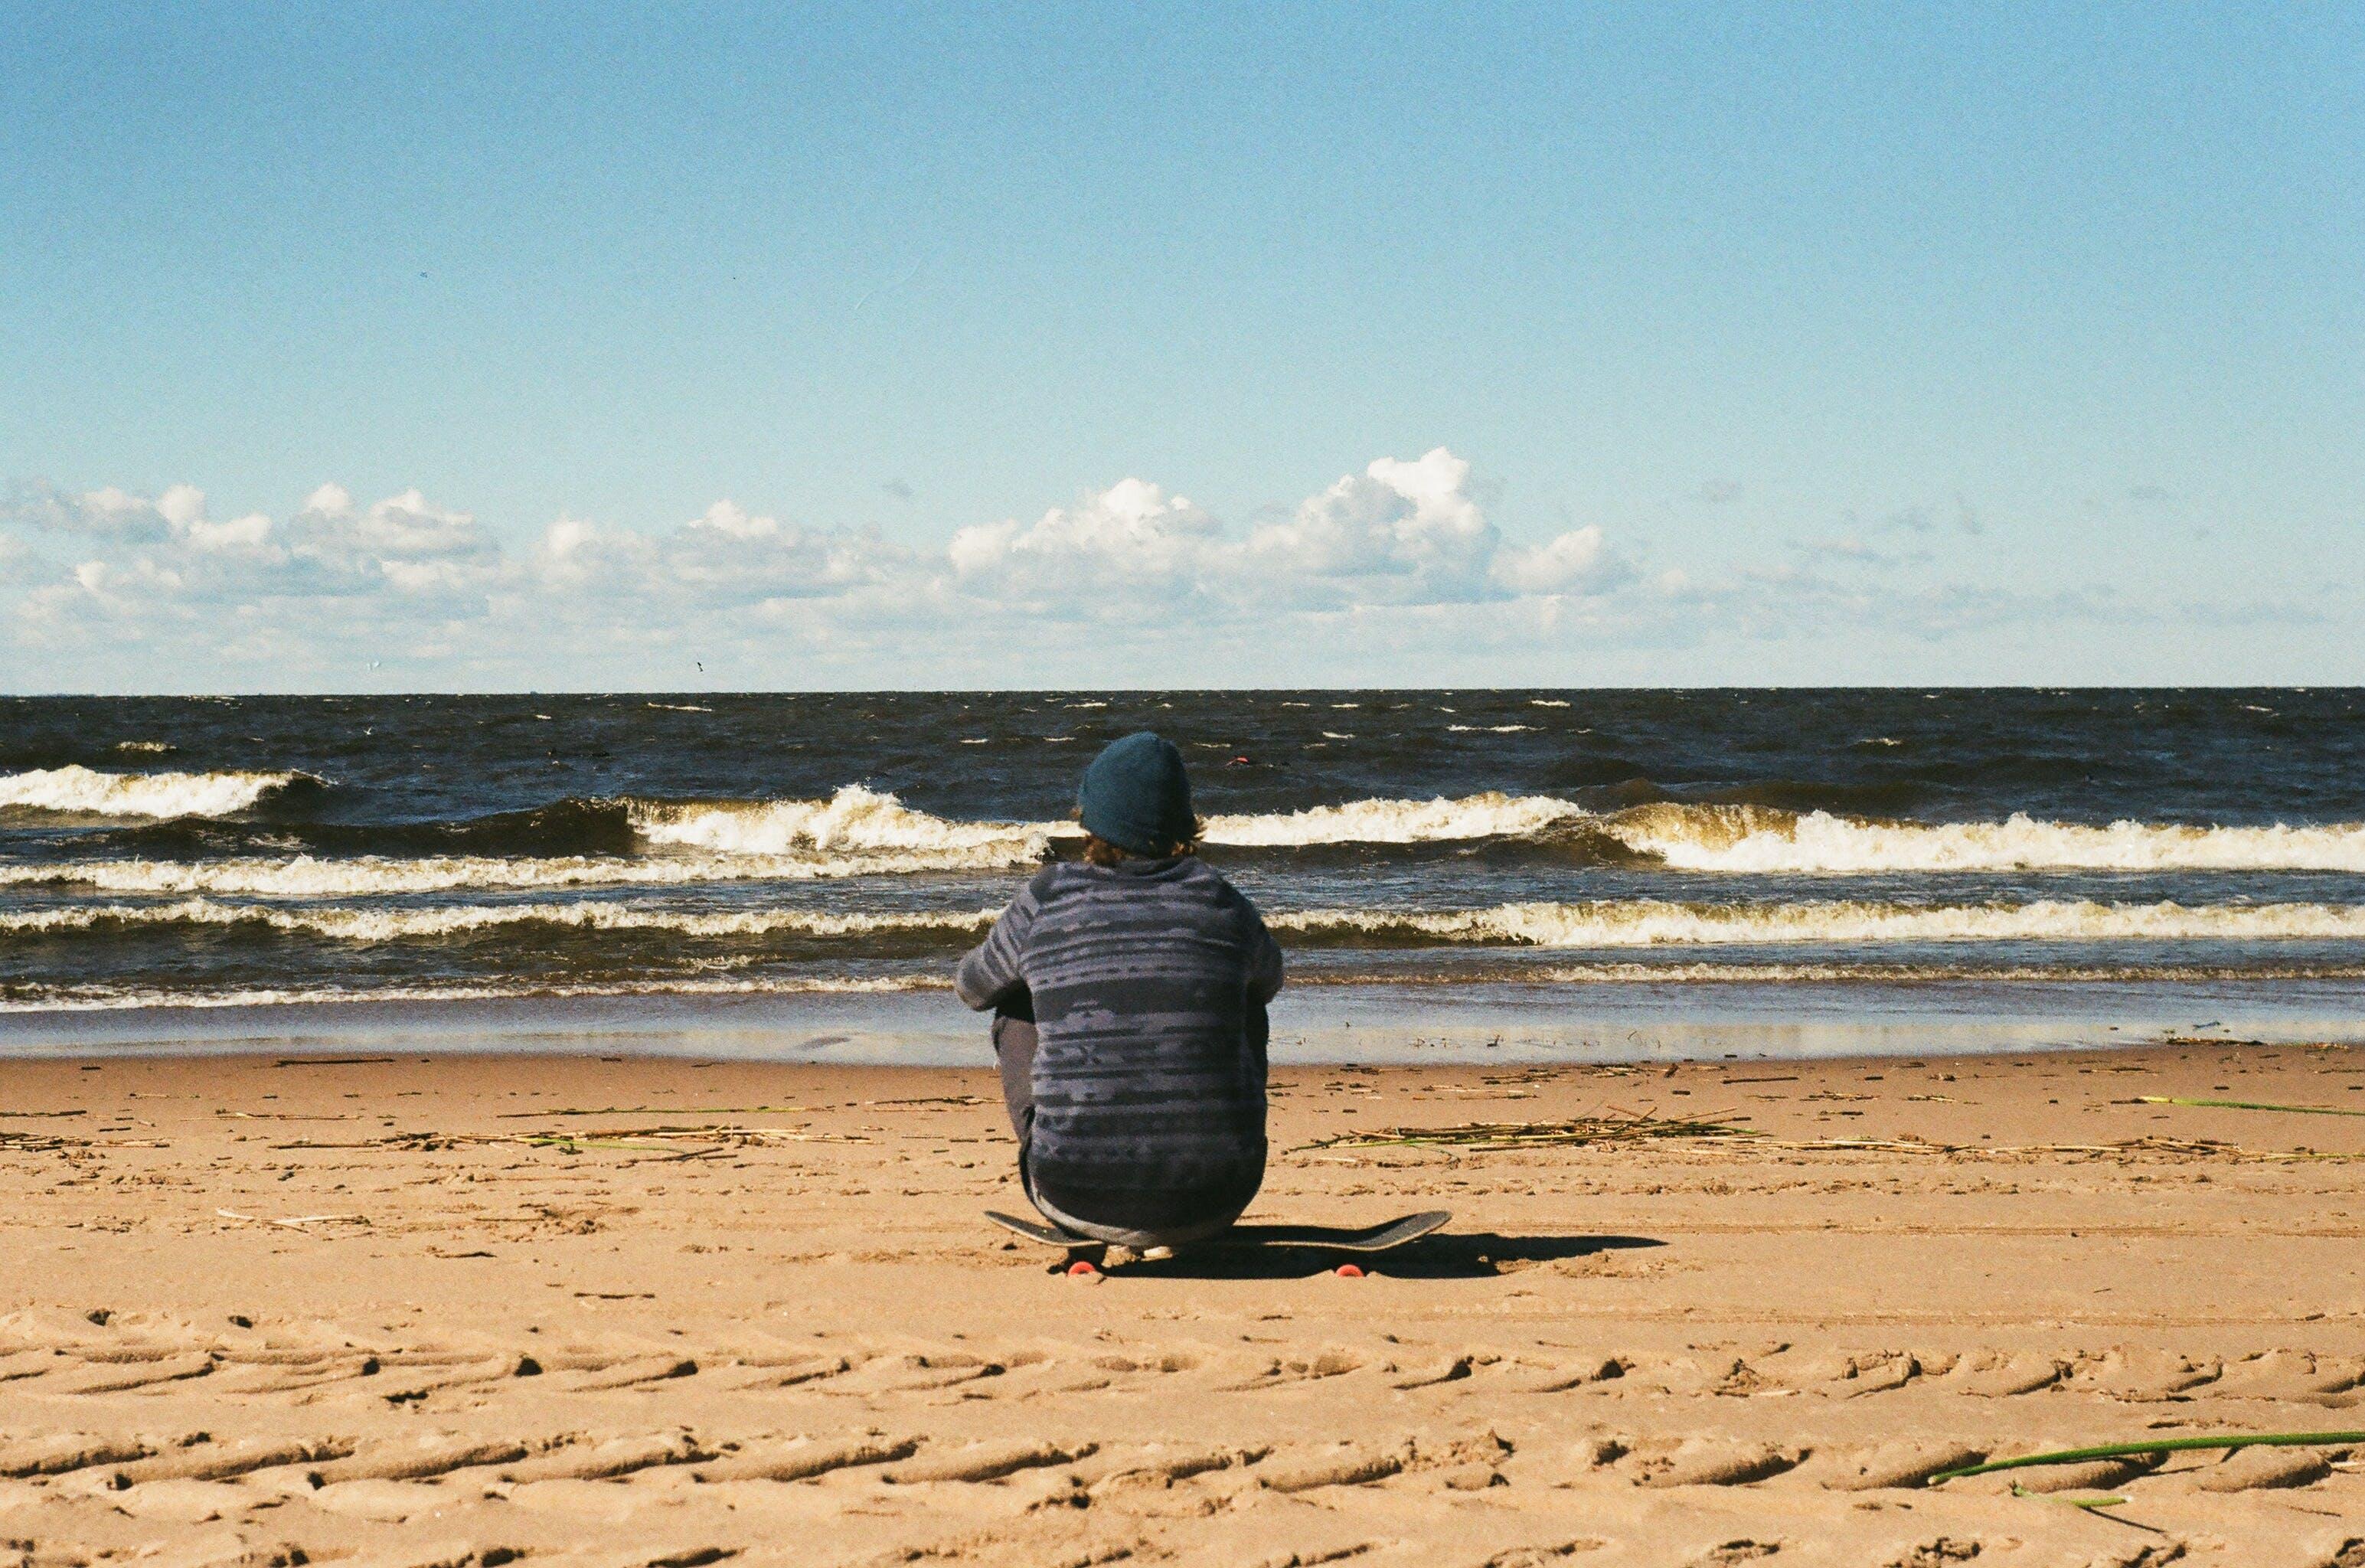 bølger, dagslys, ferie